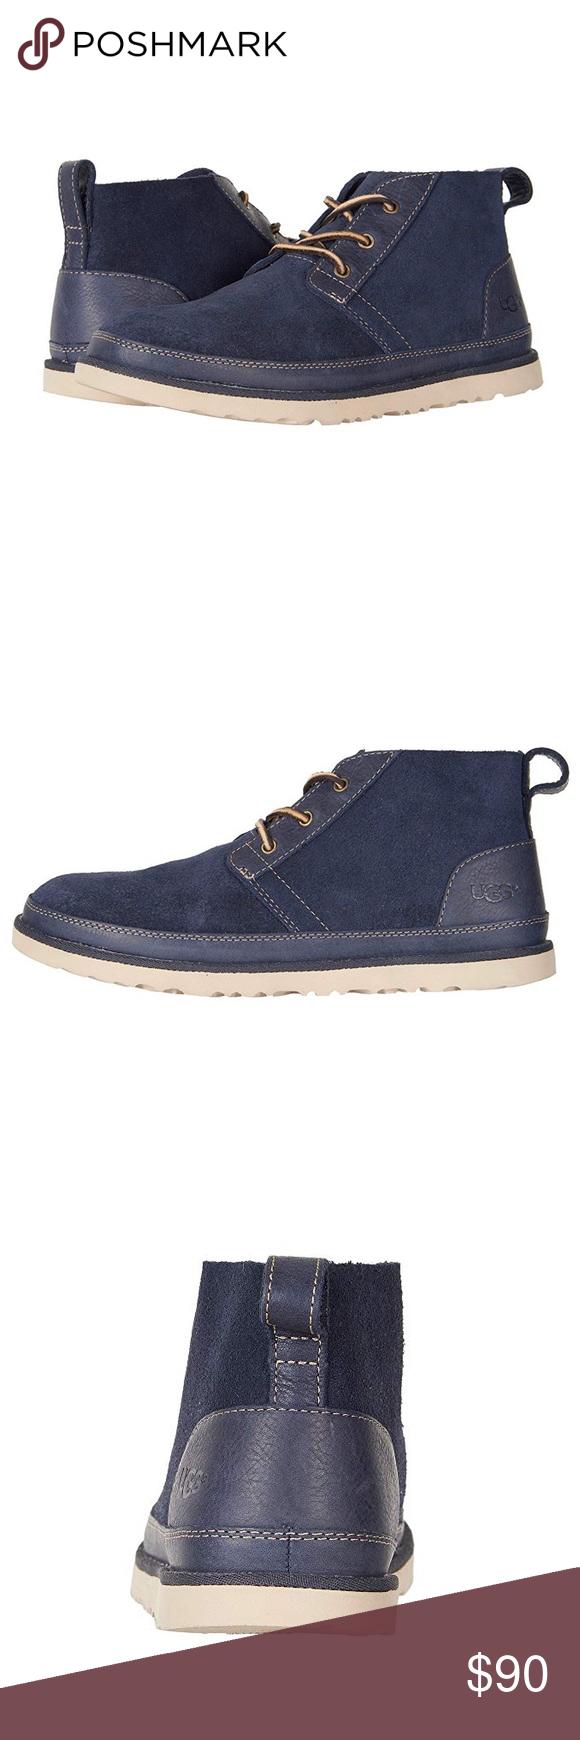 ce29ffde453 NEW UGG® Neumel Unlined Leather chukka boot The UGG® Neumel Unlined ...